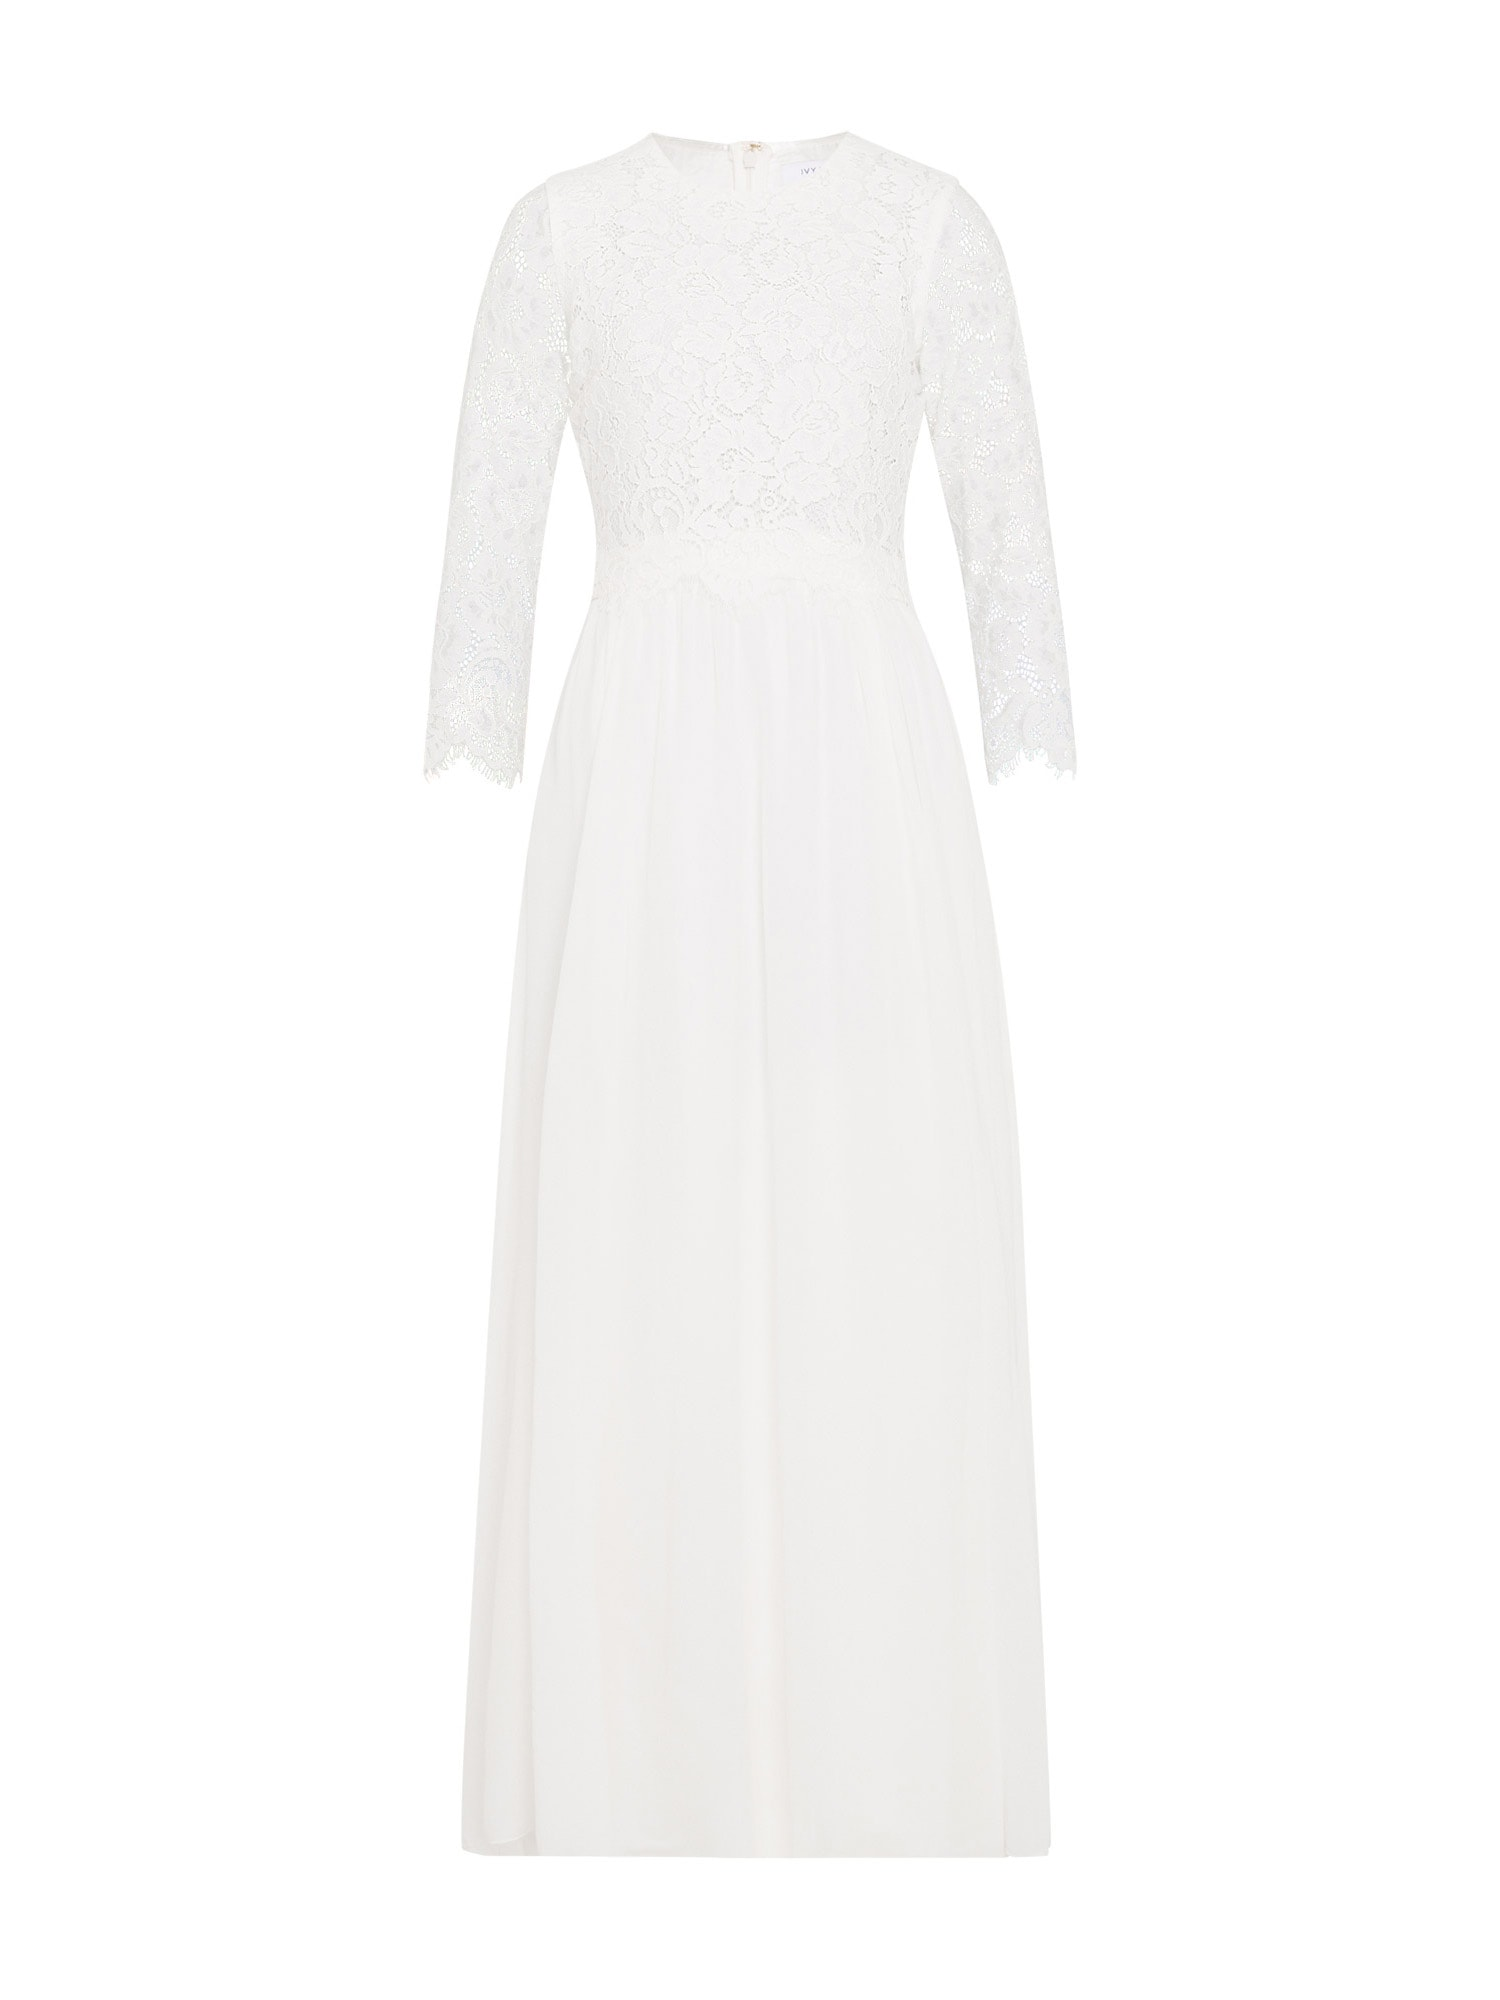 Společenské šaty Bridal 2in1 Maxi bílá IVY & OAK